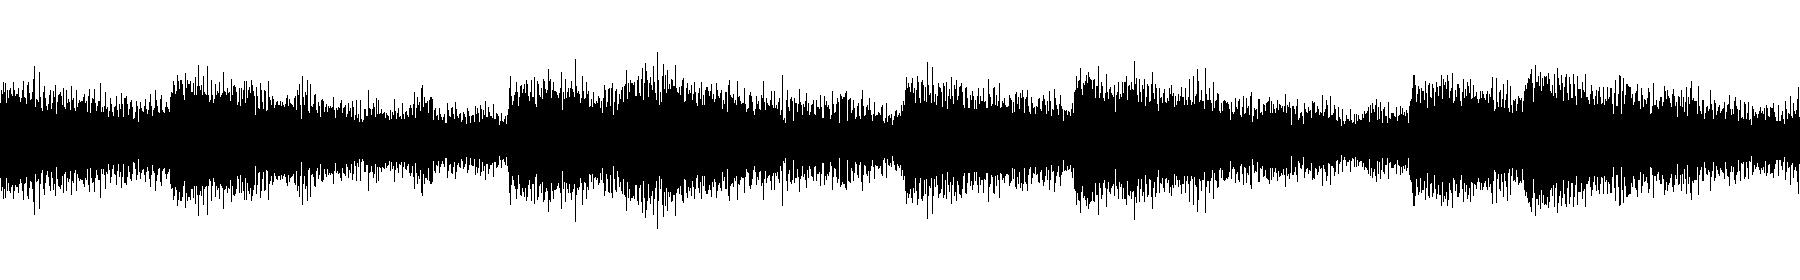 92 c funkpad sp 01